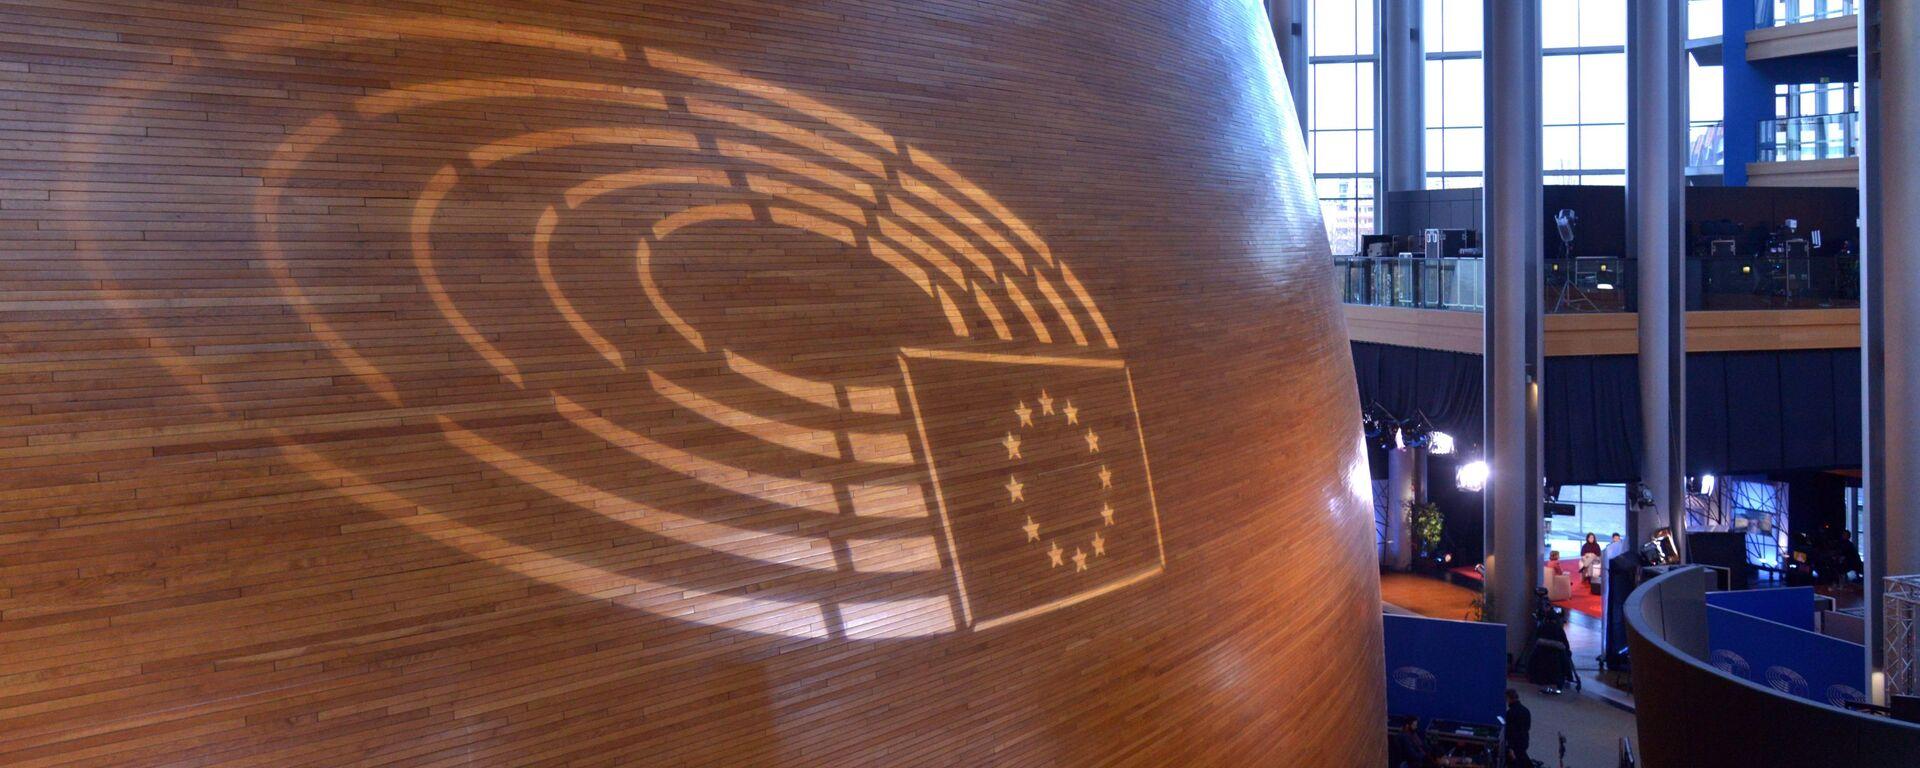 Sesja plenarna Parlamentu Europejskiego - Sputnik Polska, 1920, 23.03.2021